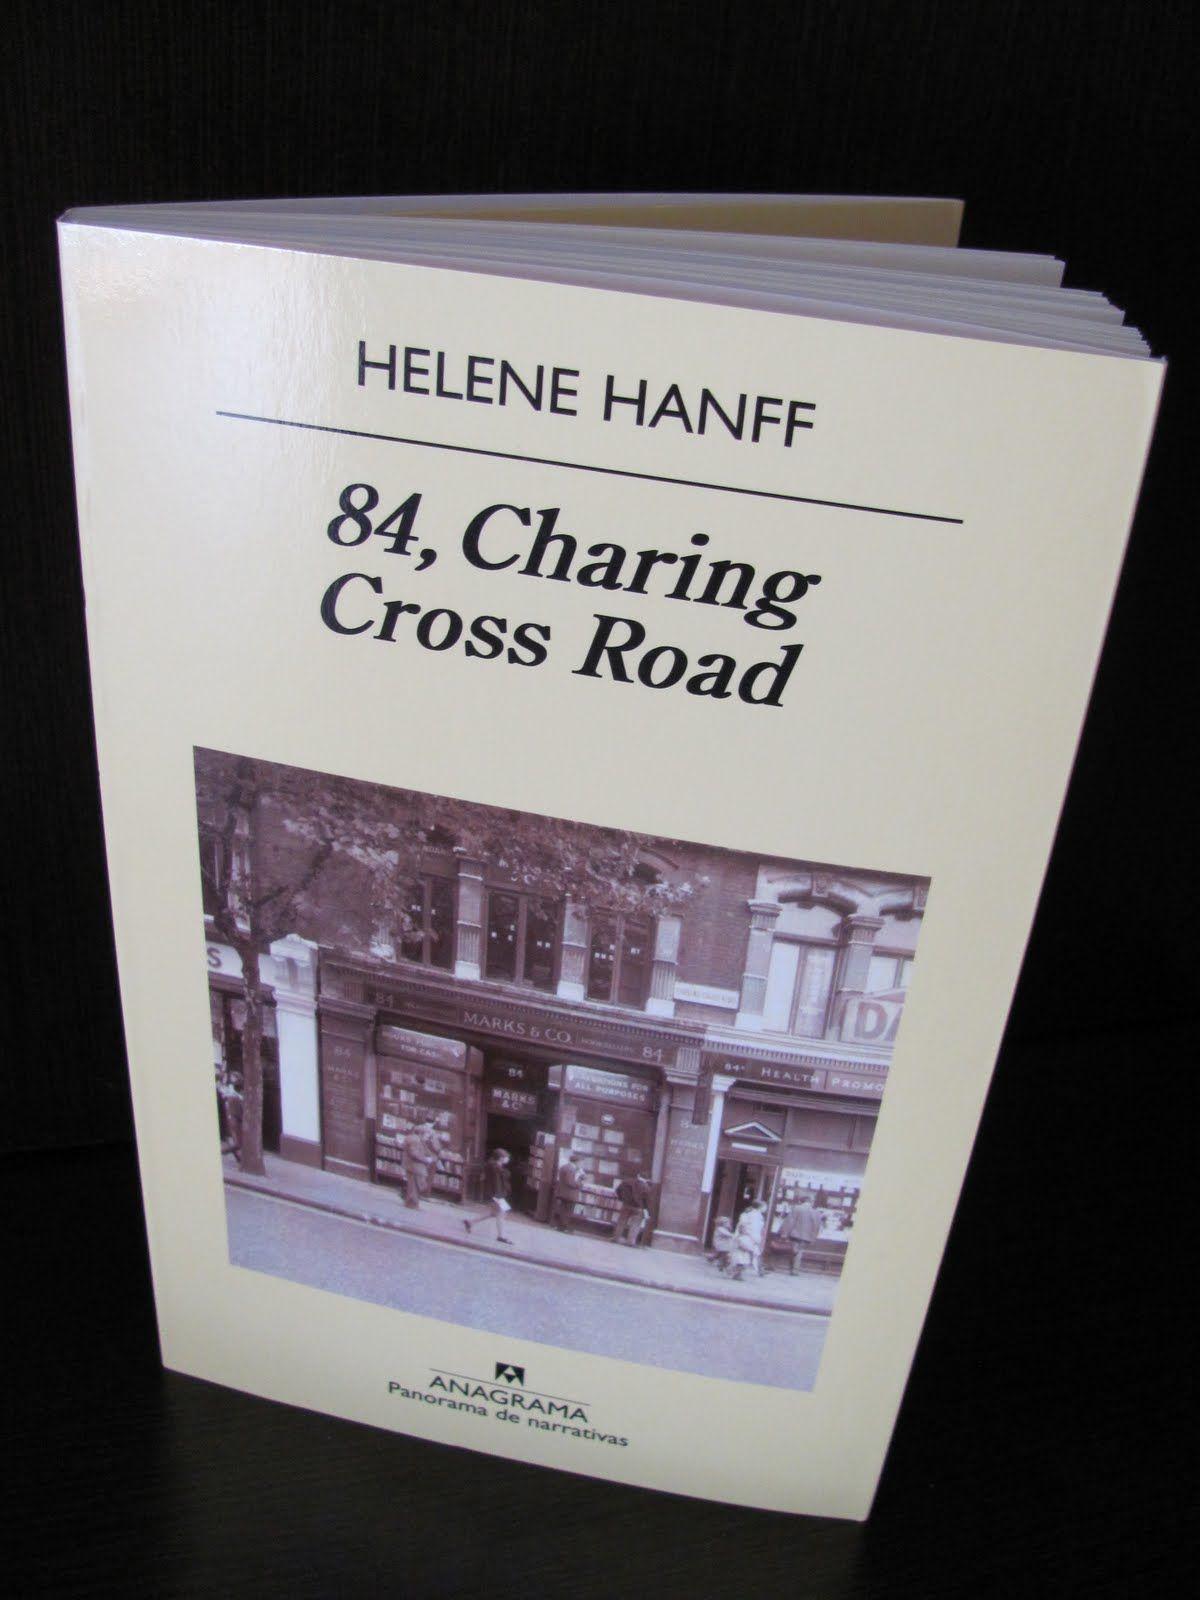 84, Charing Cross Road (Helene Hanff)